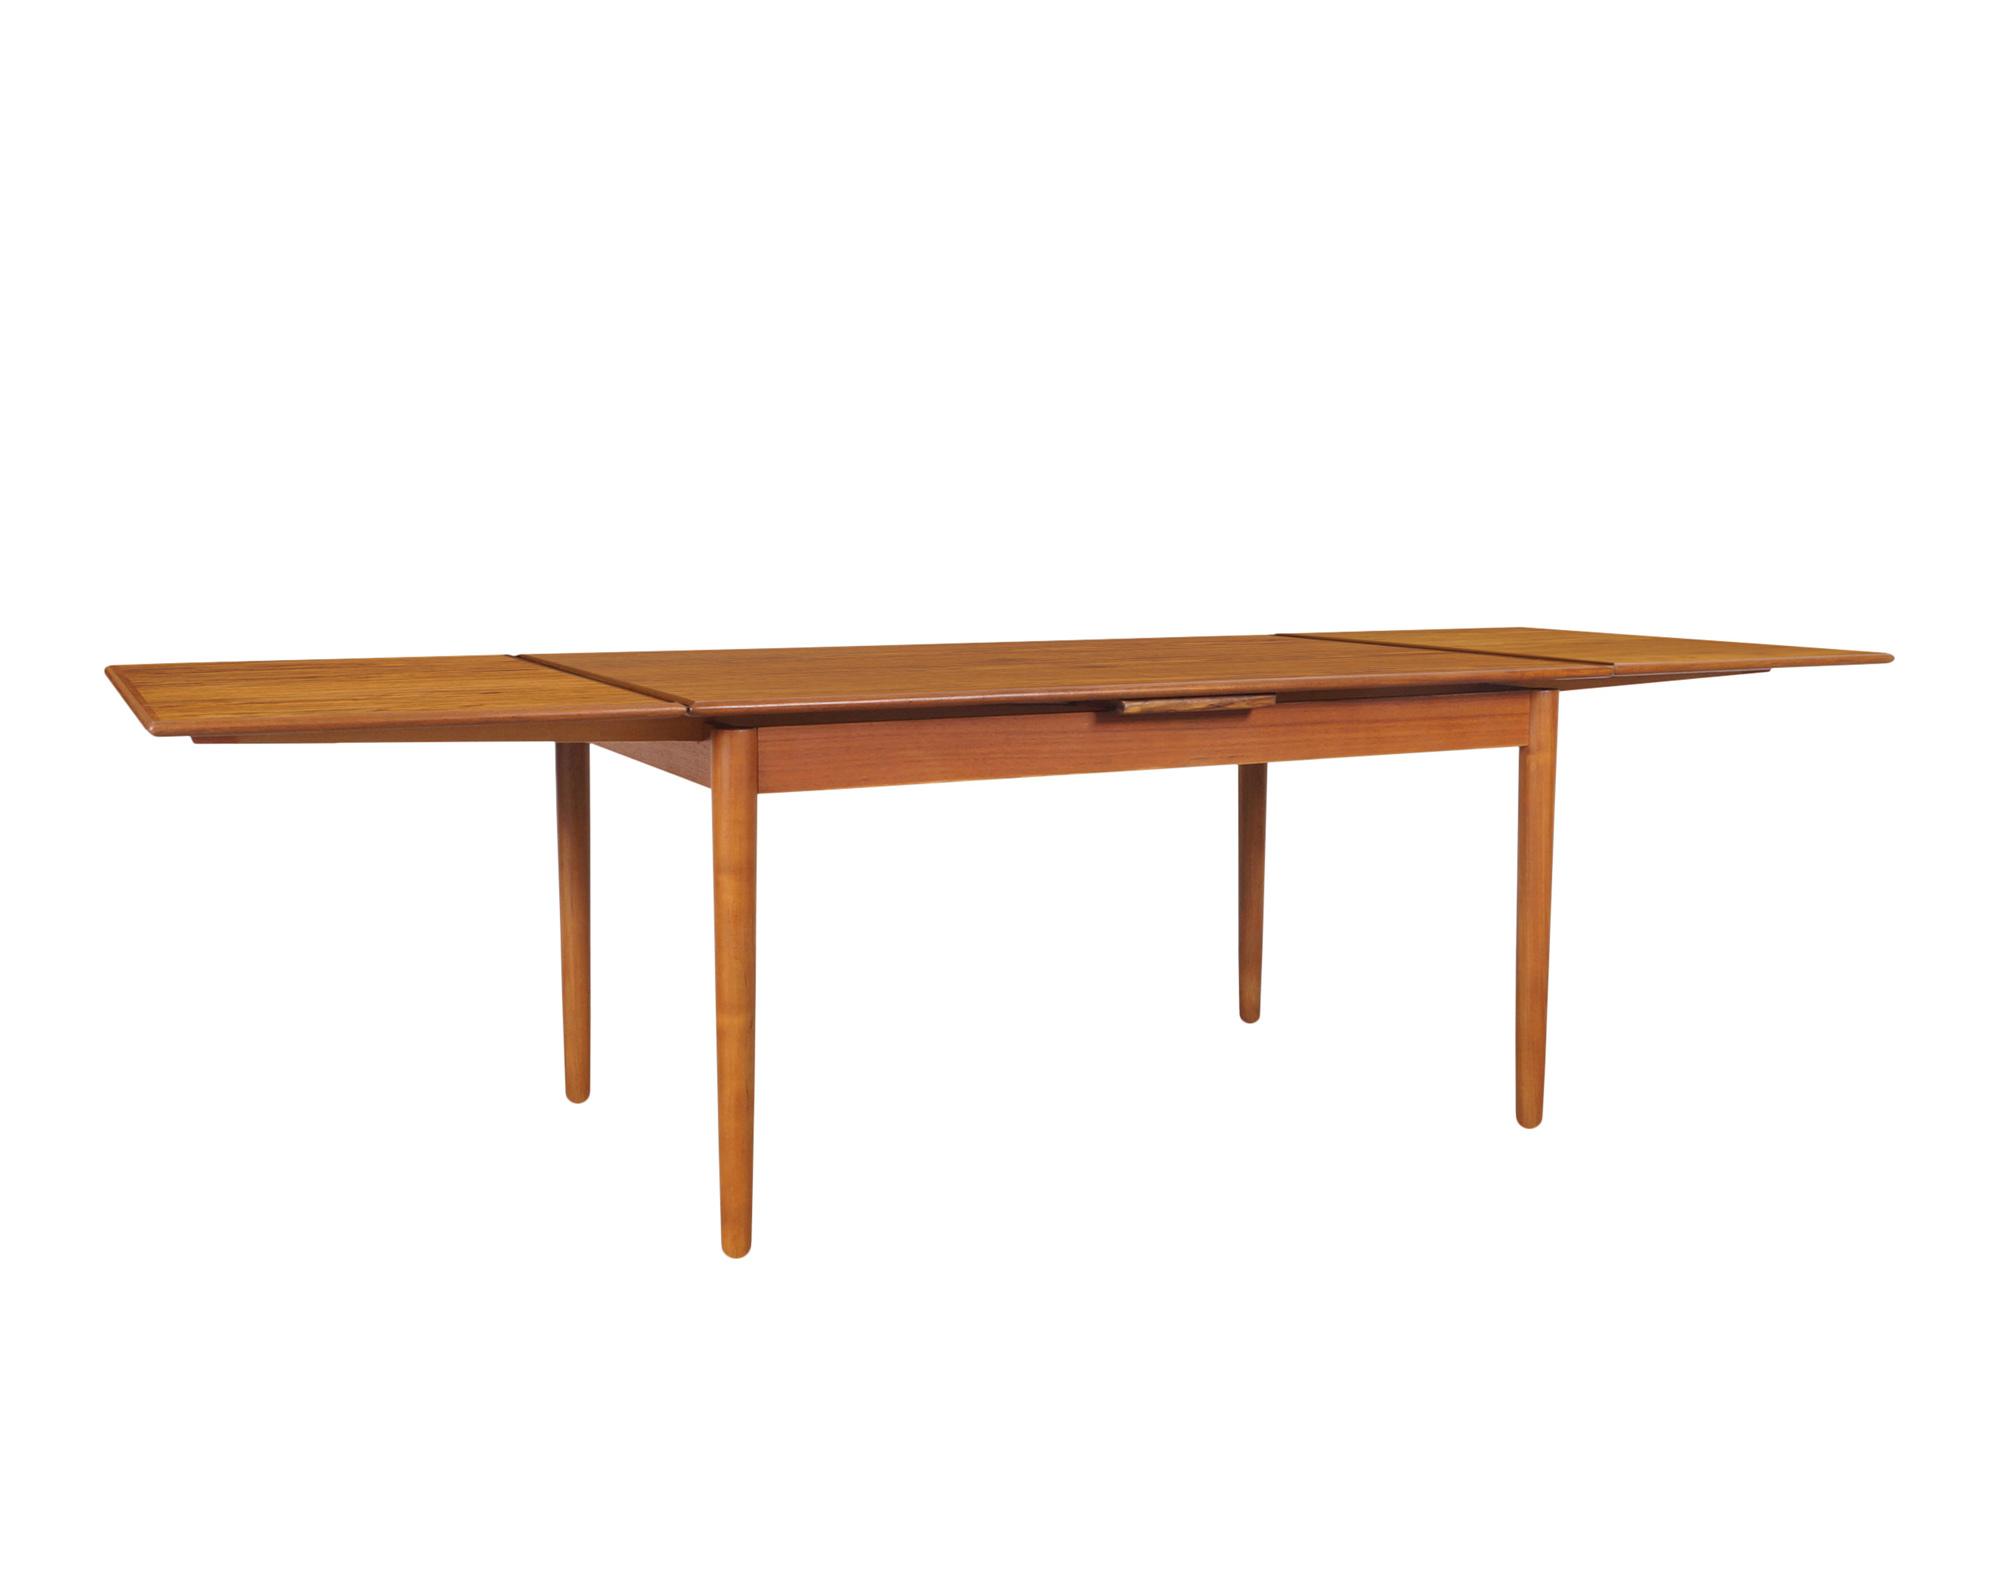 Danish Modern Expanding Teak Dining Table by AM Møbler